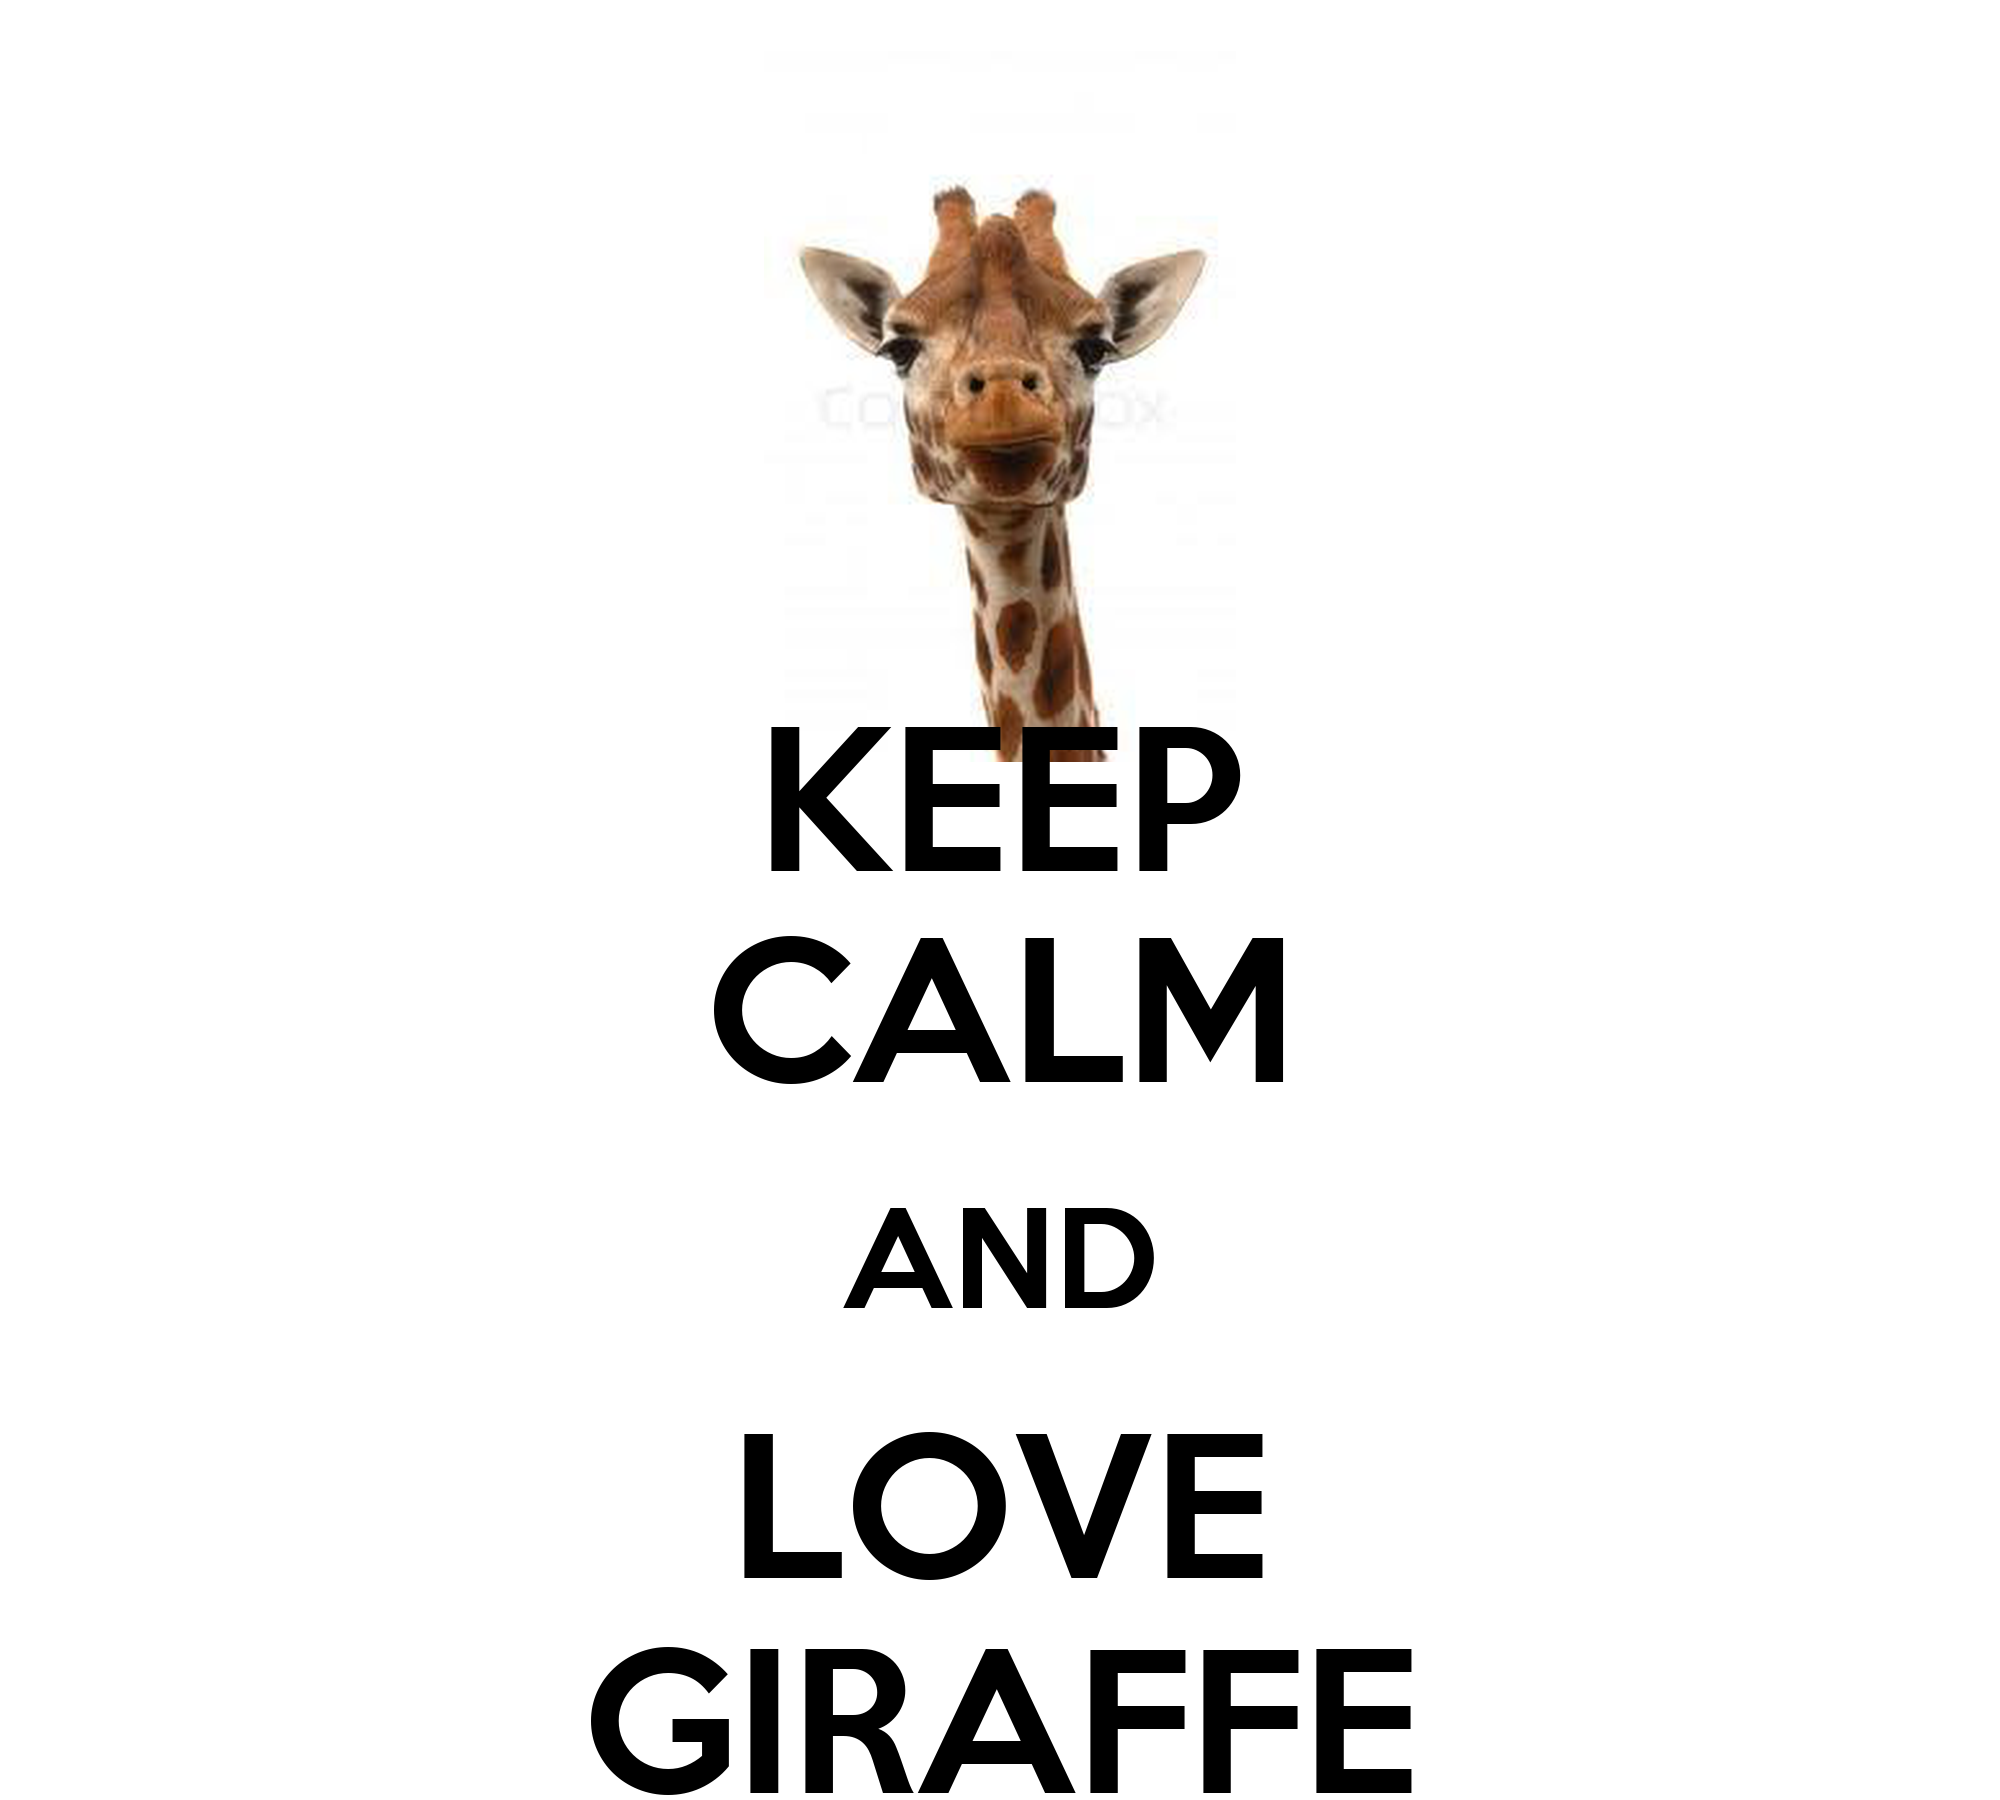 KEEP CALM AND LOVE GIRAFFE Poster - 240.0KB